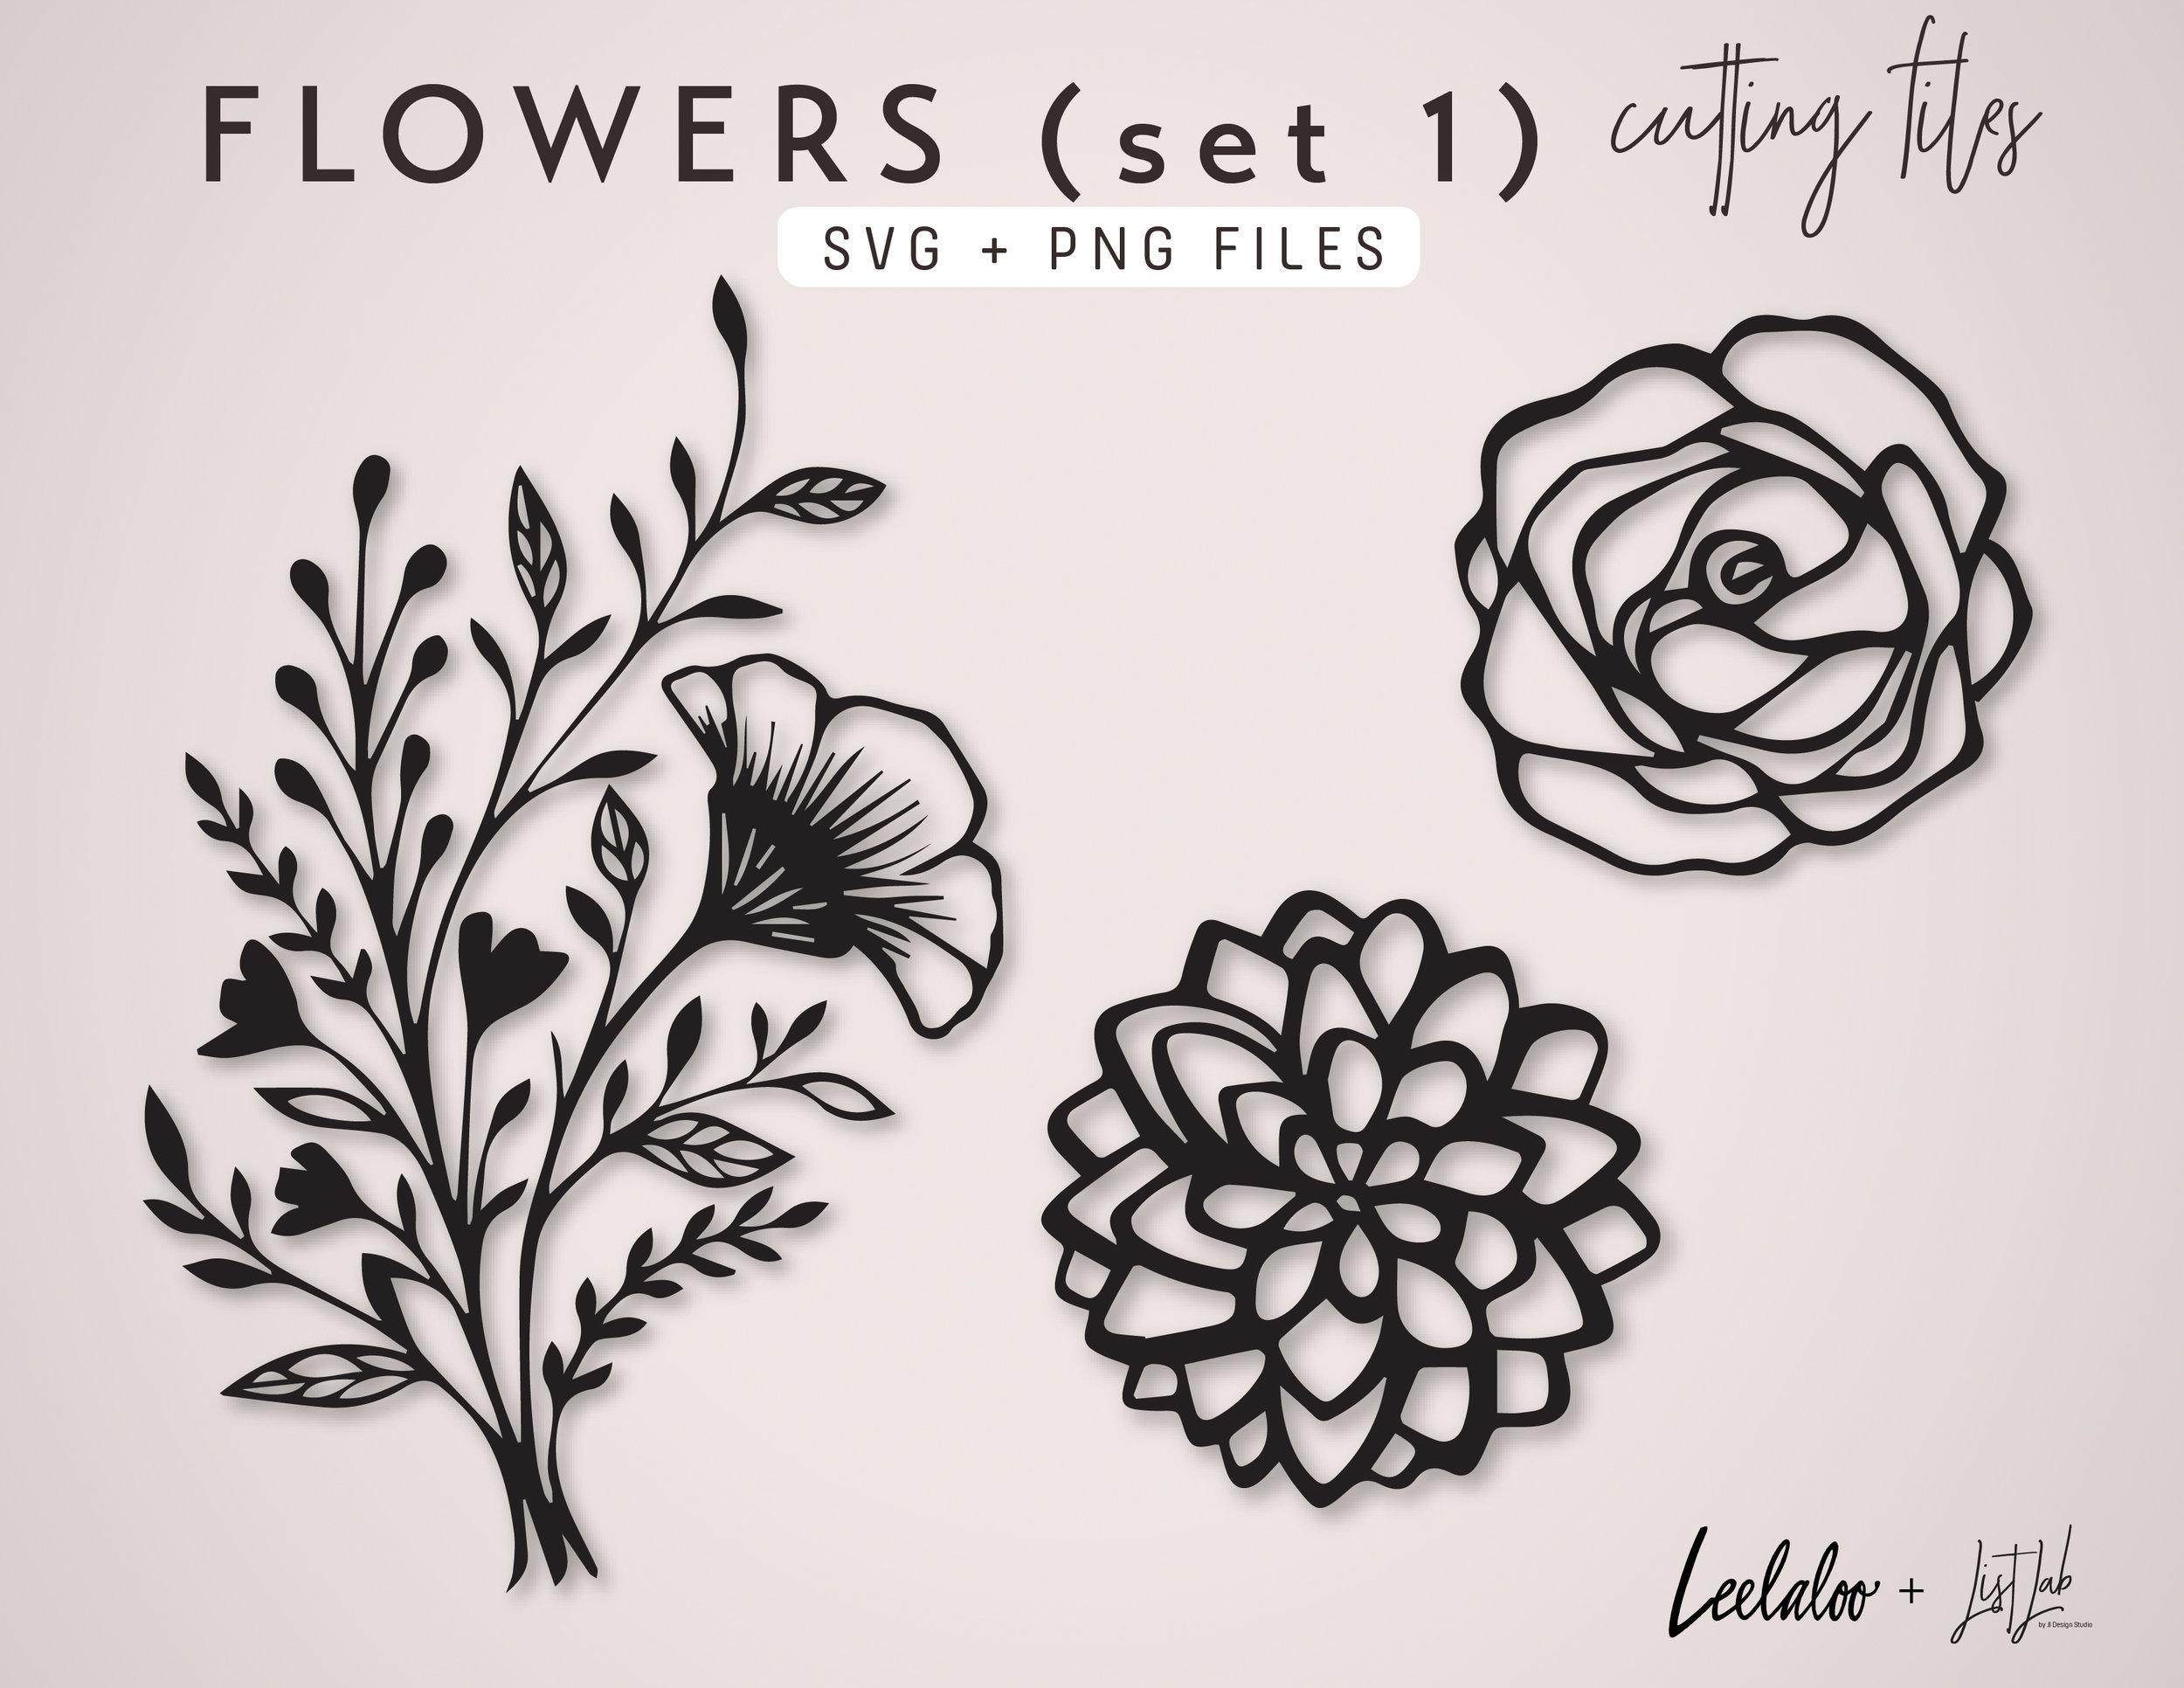 leelaloo_flower-08a.jpg